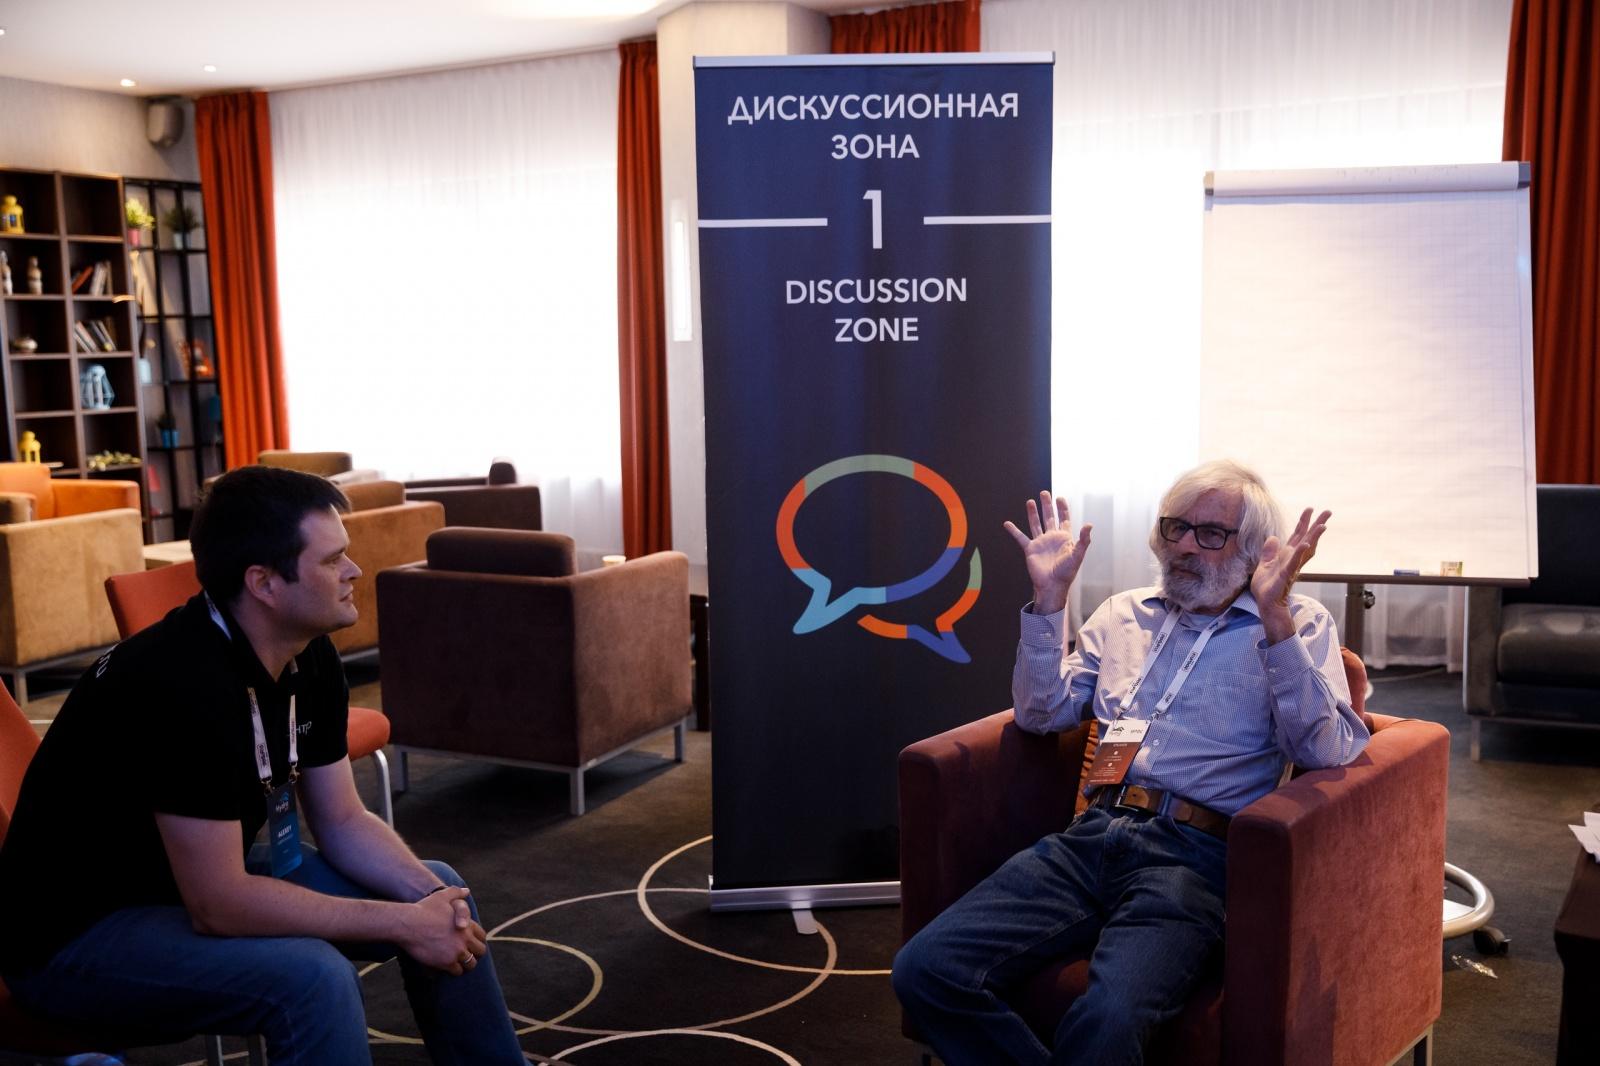 Три лауреата премии Дейкстры: как прошли Hydra 2019 и SPTDC 2019 - 11